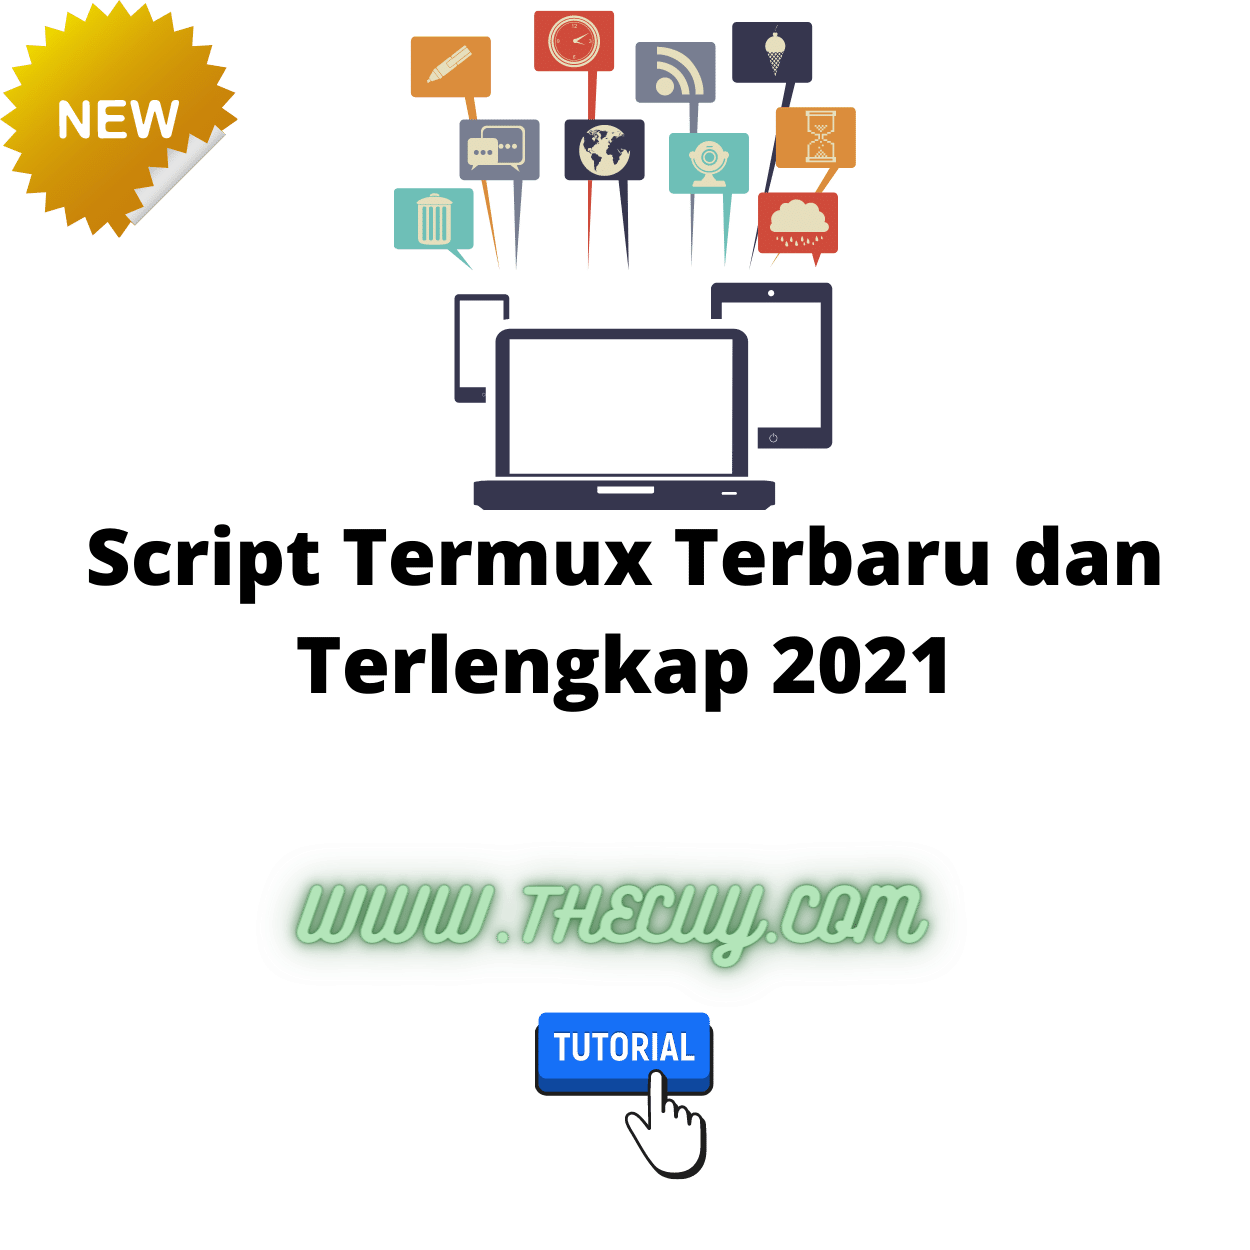 Script Termux Terbaru dan Terlengkap 2021